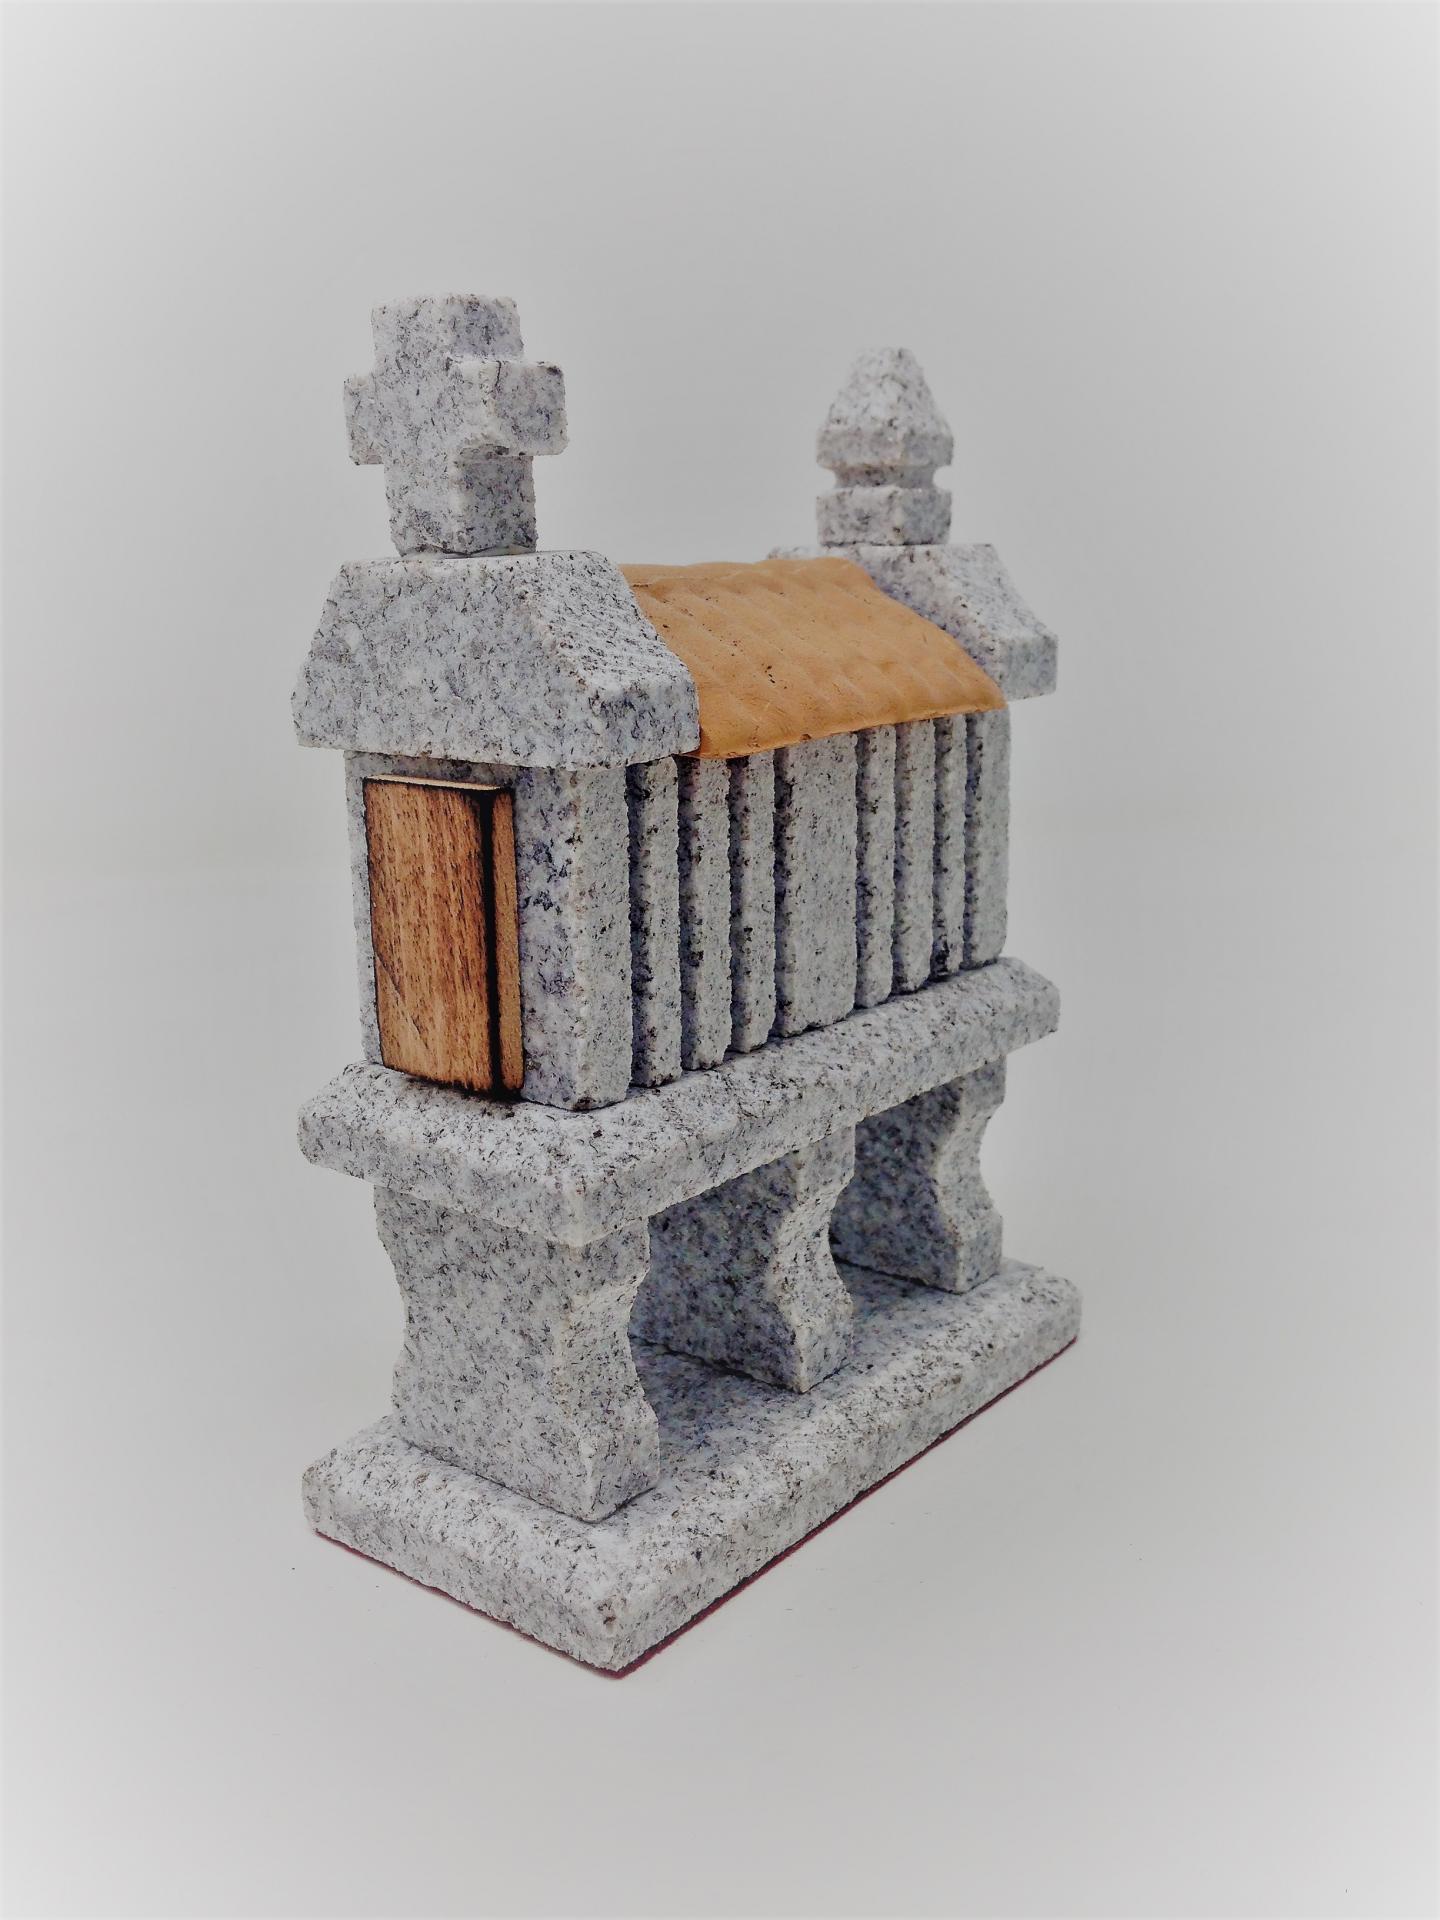 Hórreo de granito miniatura (3 pies)